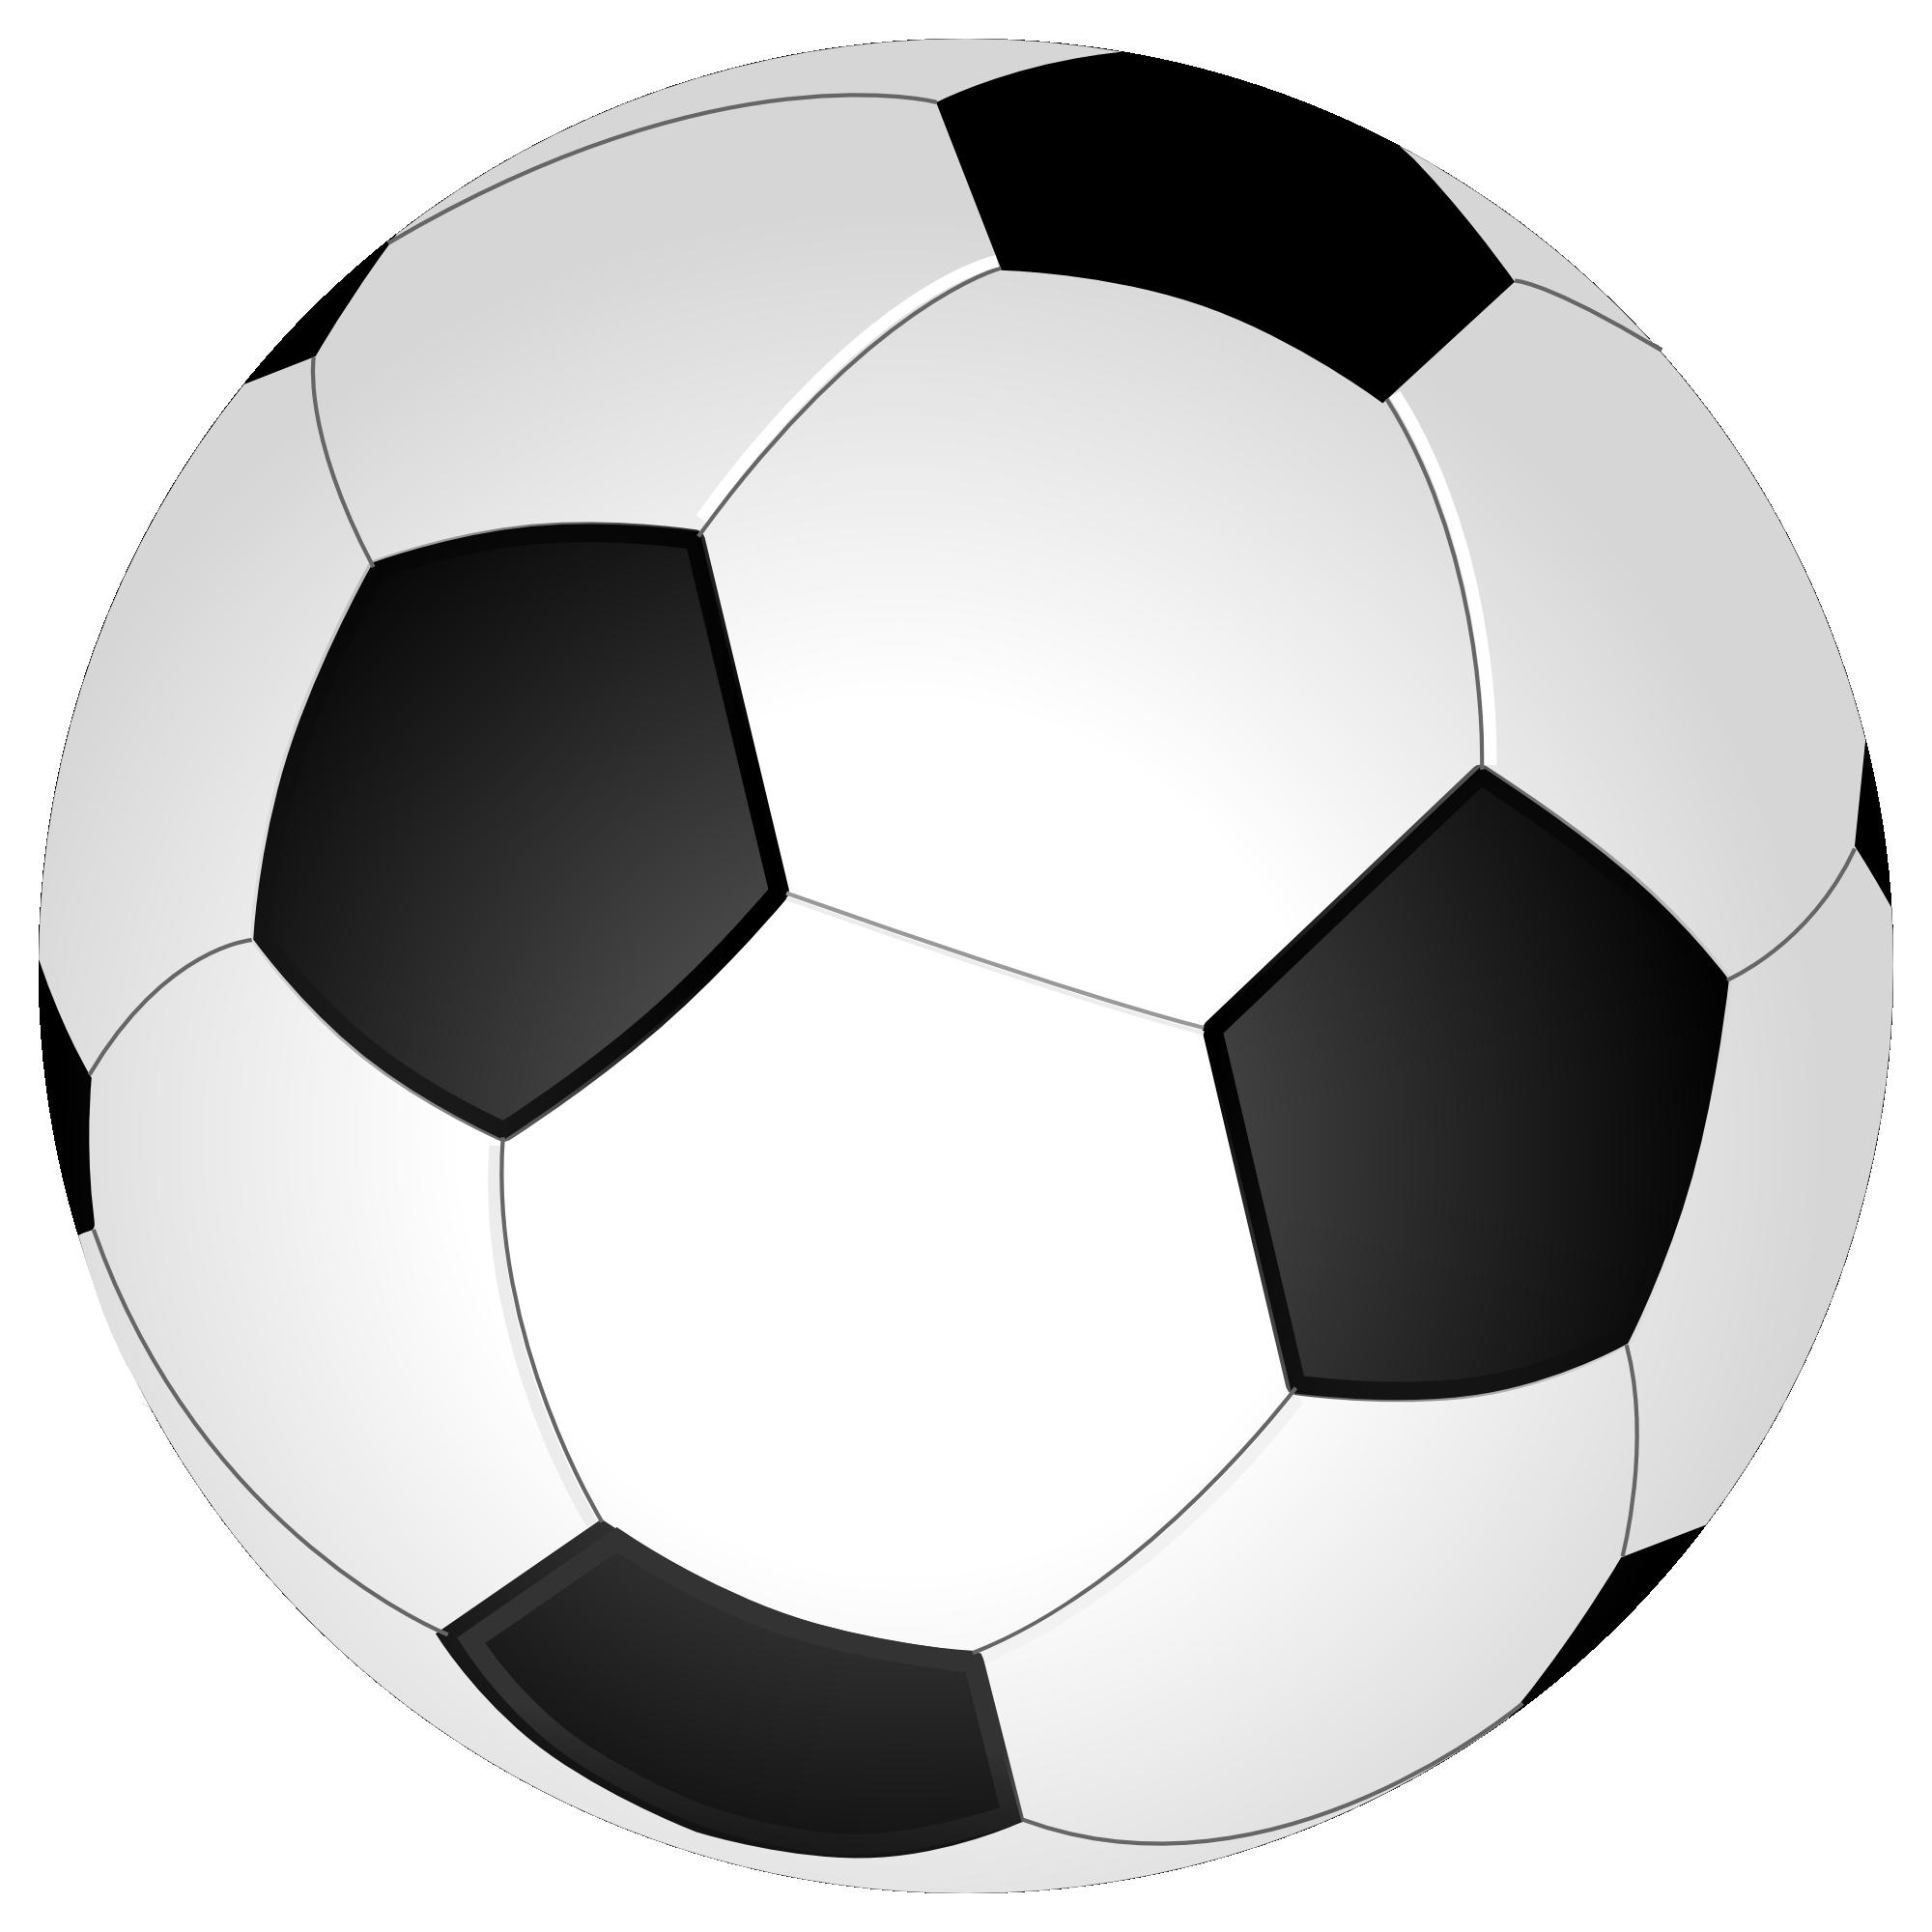 Football clipart transparent background image free Football Cliparts Transparent Free Download Clip Art - carwad.net image free